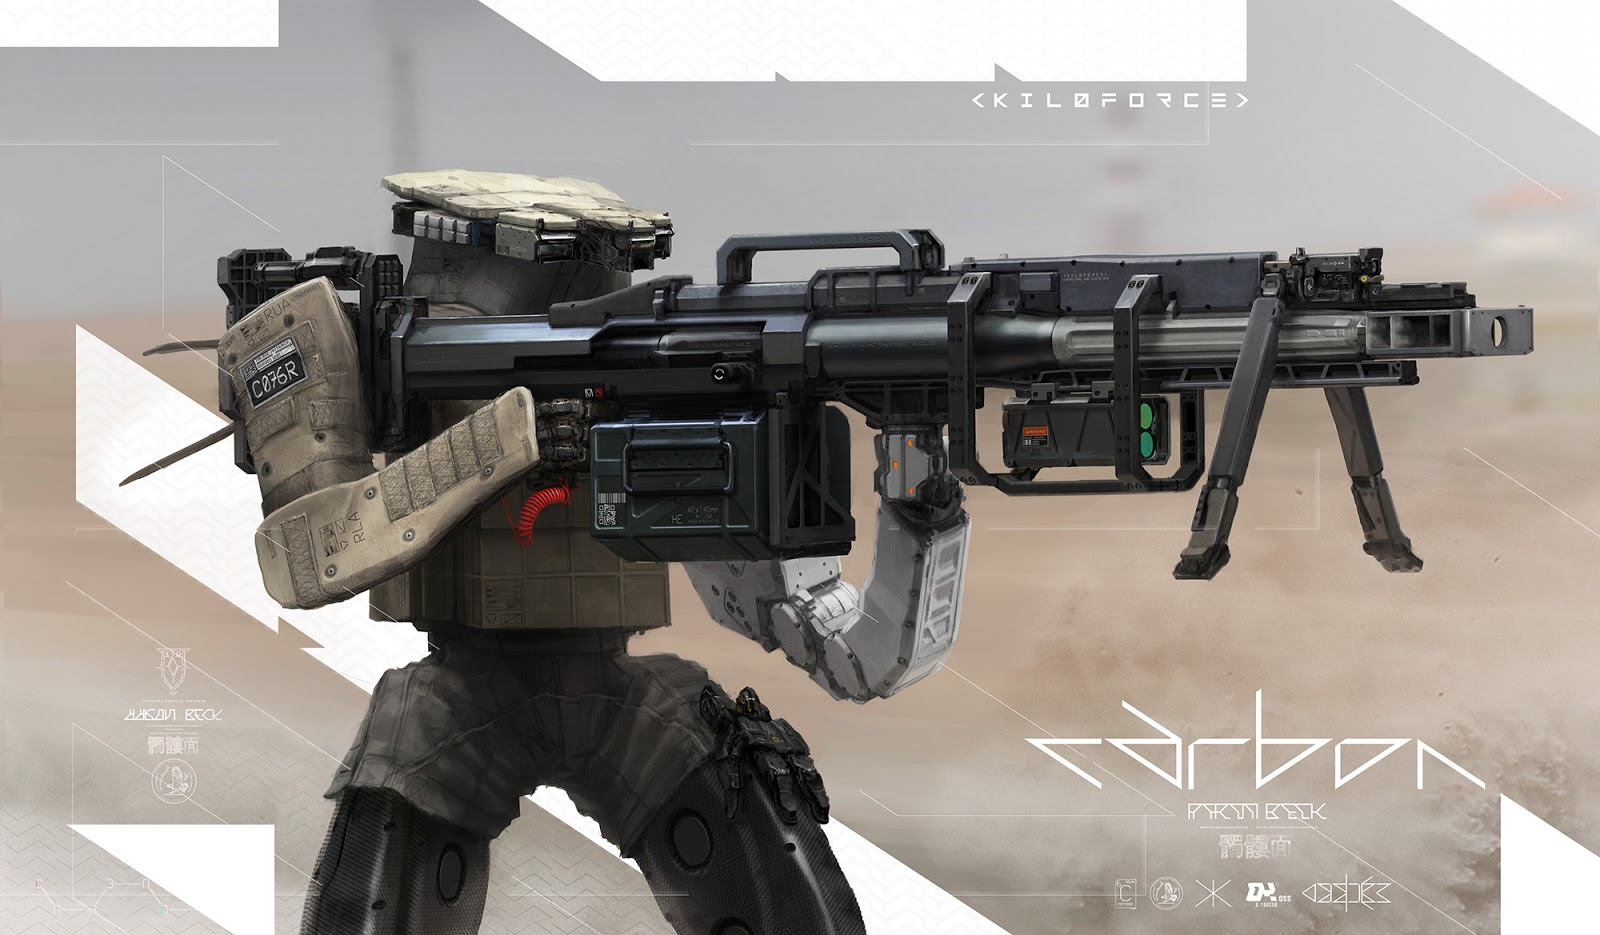 gunner_arm_05_flat_flat_04.jpg